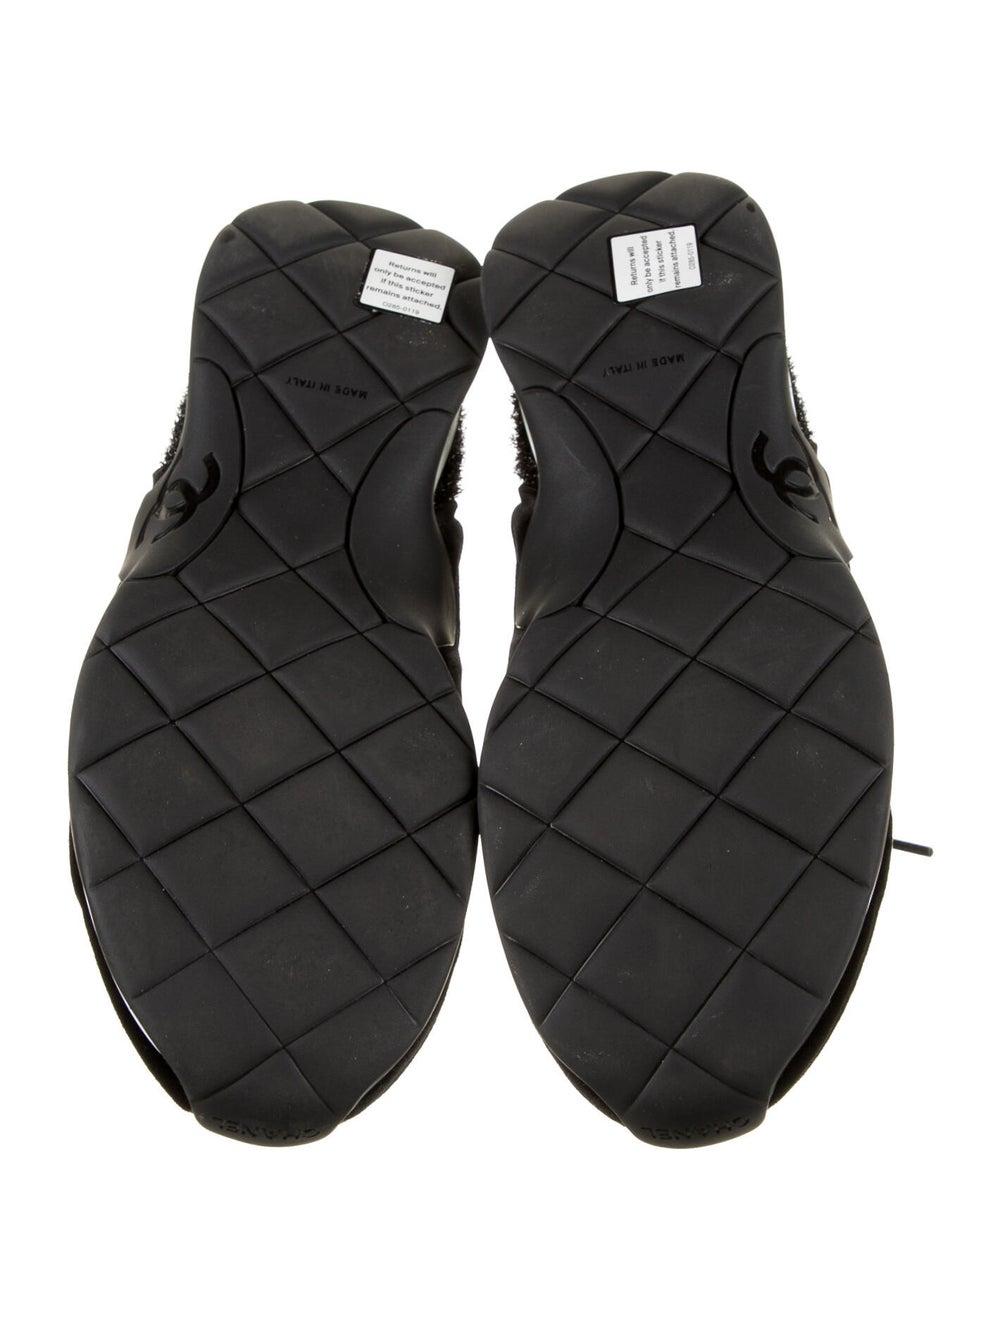 Chanel Tinsel Sock Sneakers Sneakers Black - image 5